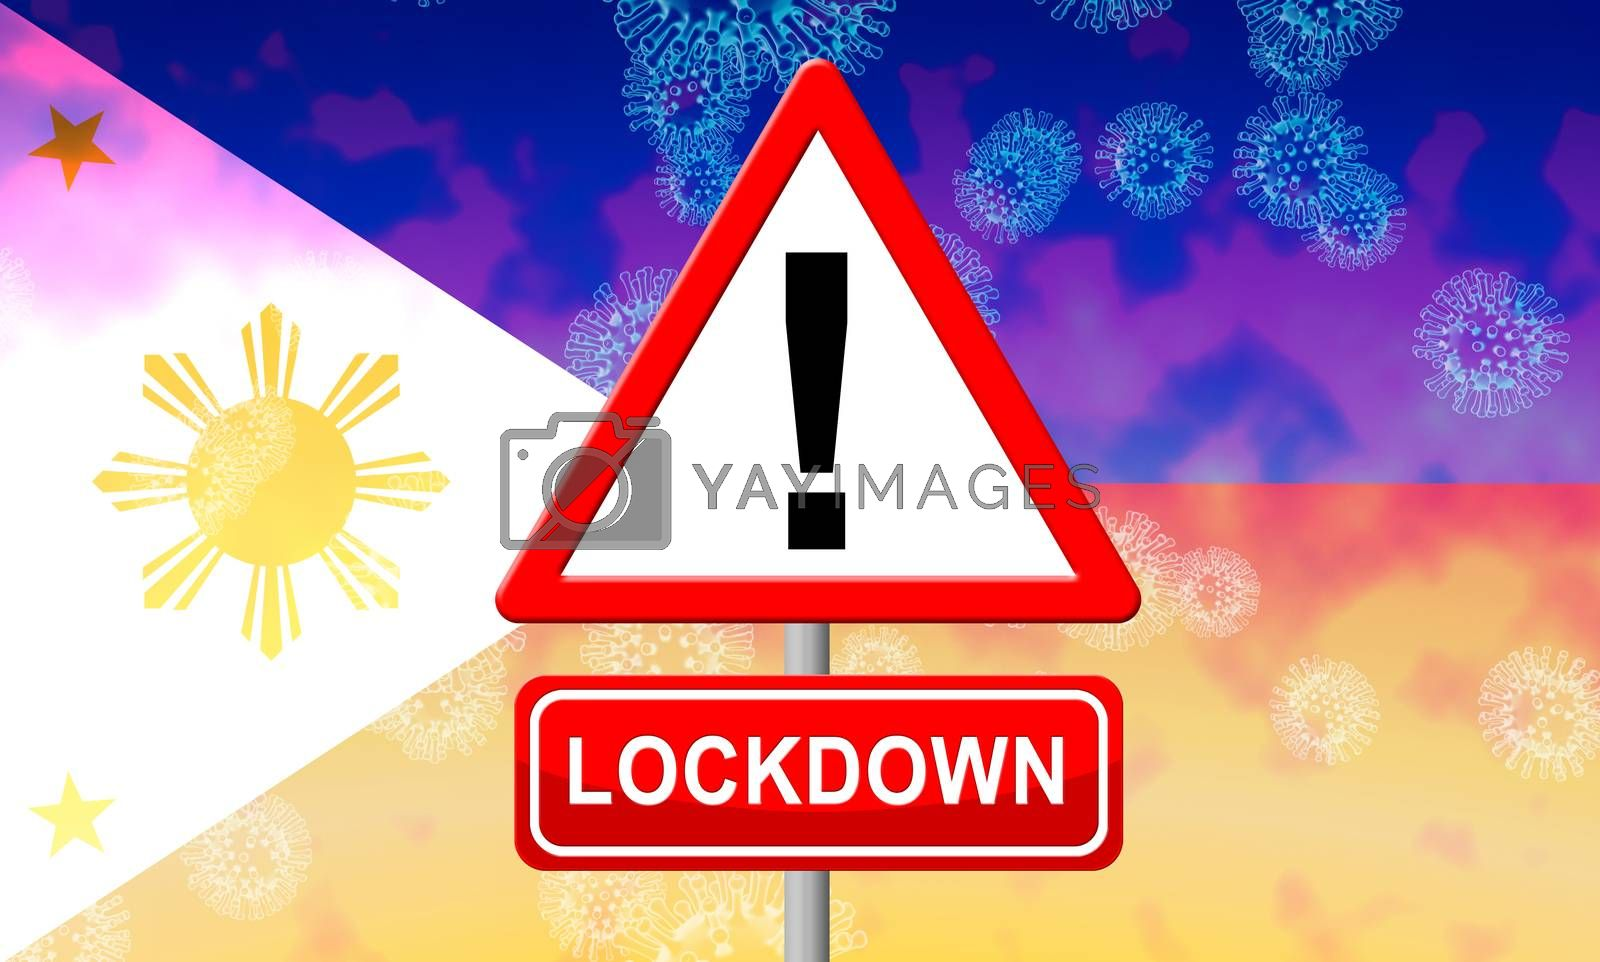 Philippines lockdown or shutdown to stop coronavirus epidemic outbreak. Covid 19 Pilipinas aim to lock down disease infection - 3d Illustration